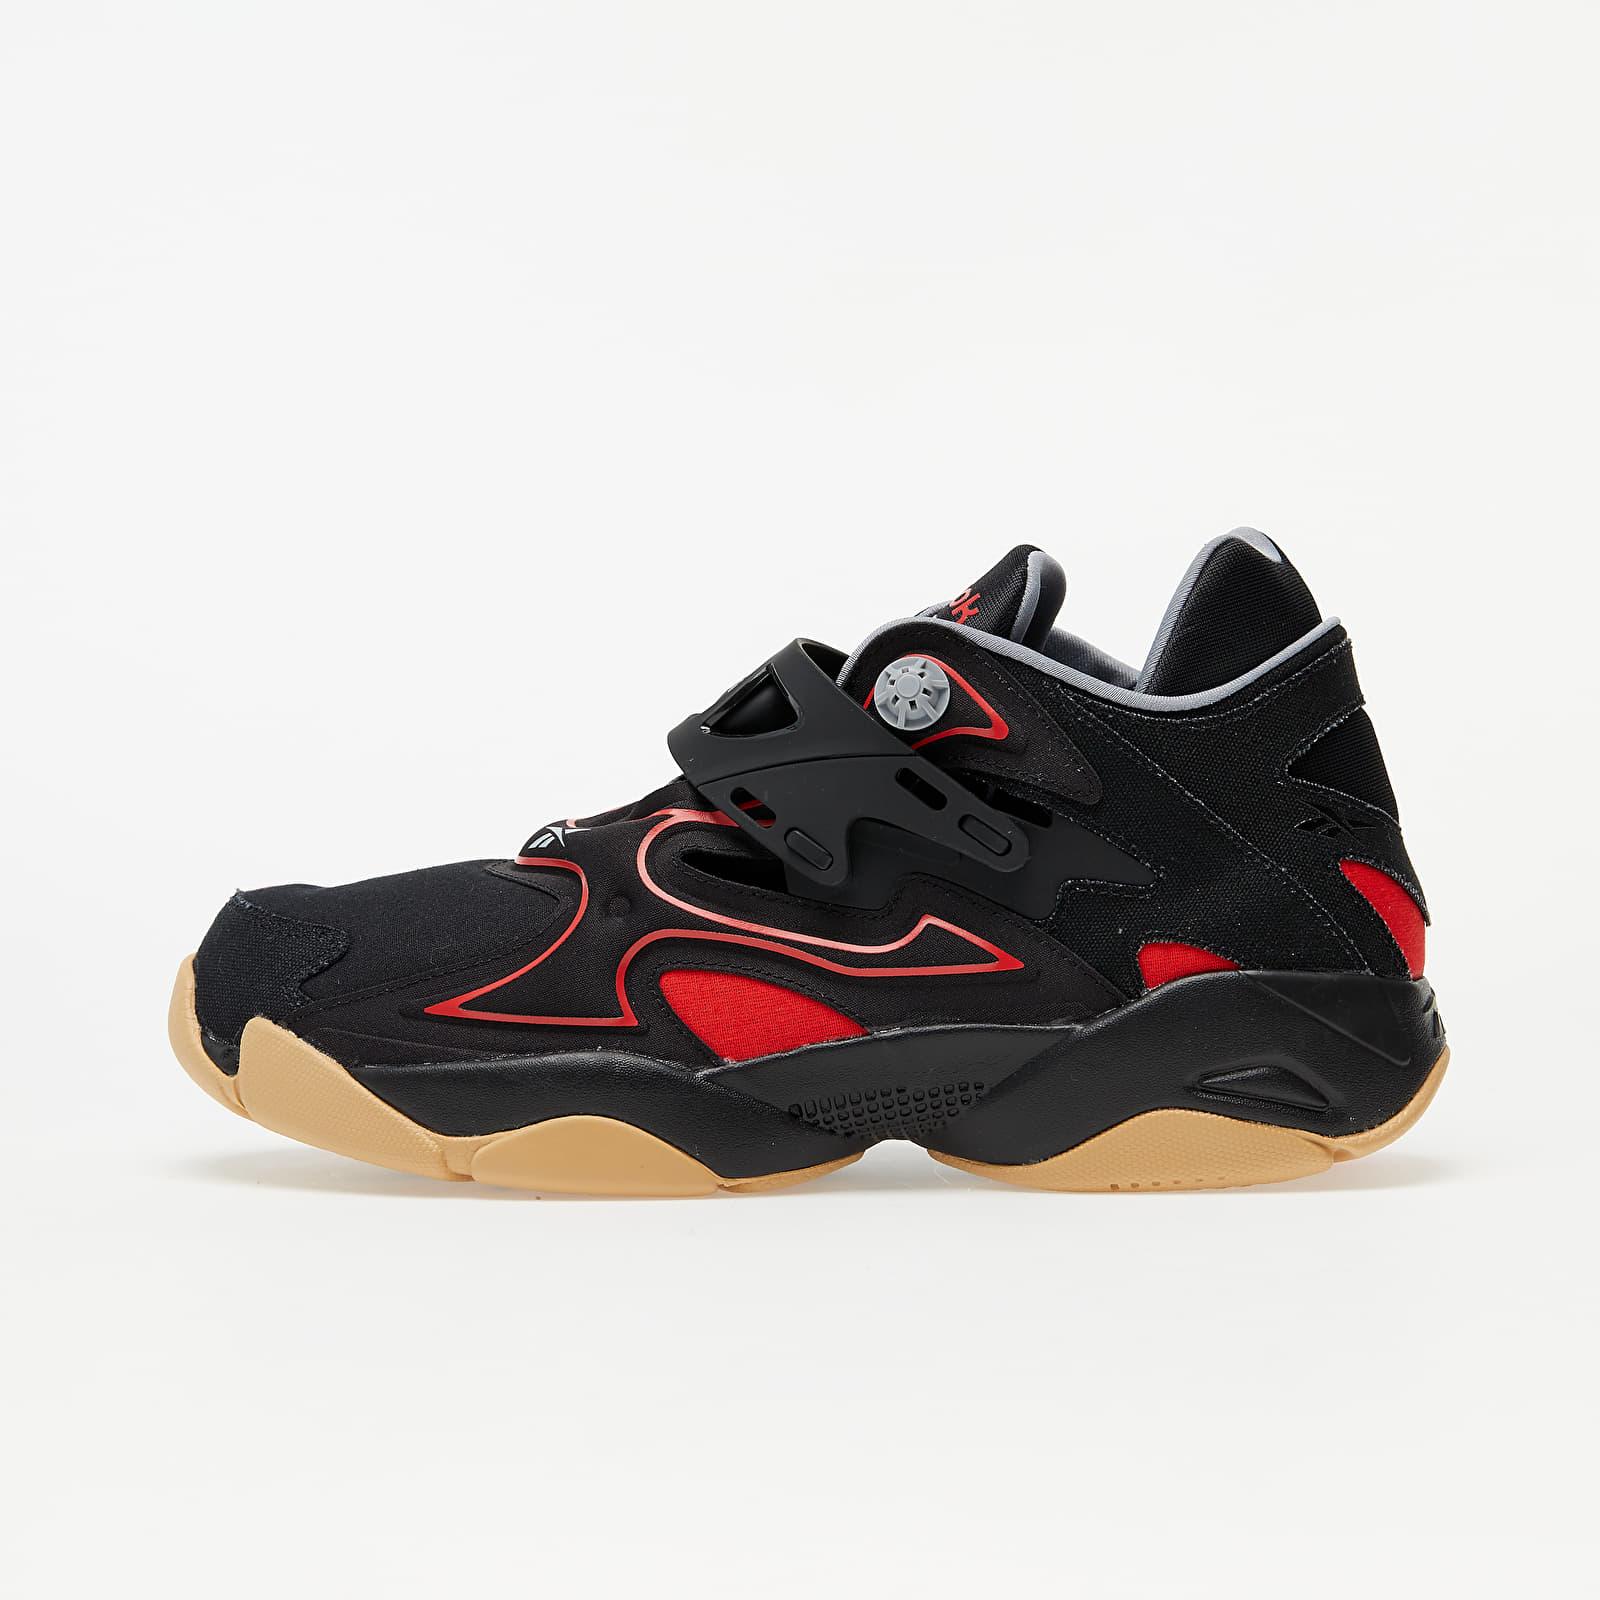 Reebok Pump Court Black/ Insane Red/ Rbkg02 FW7821